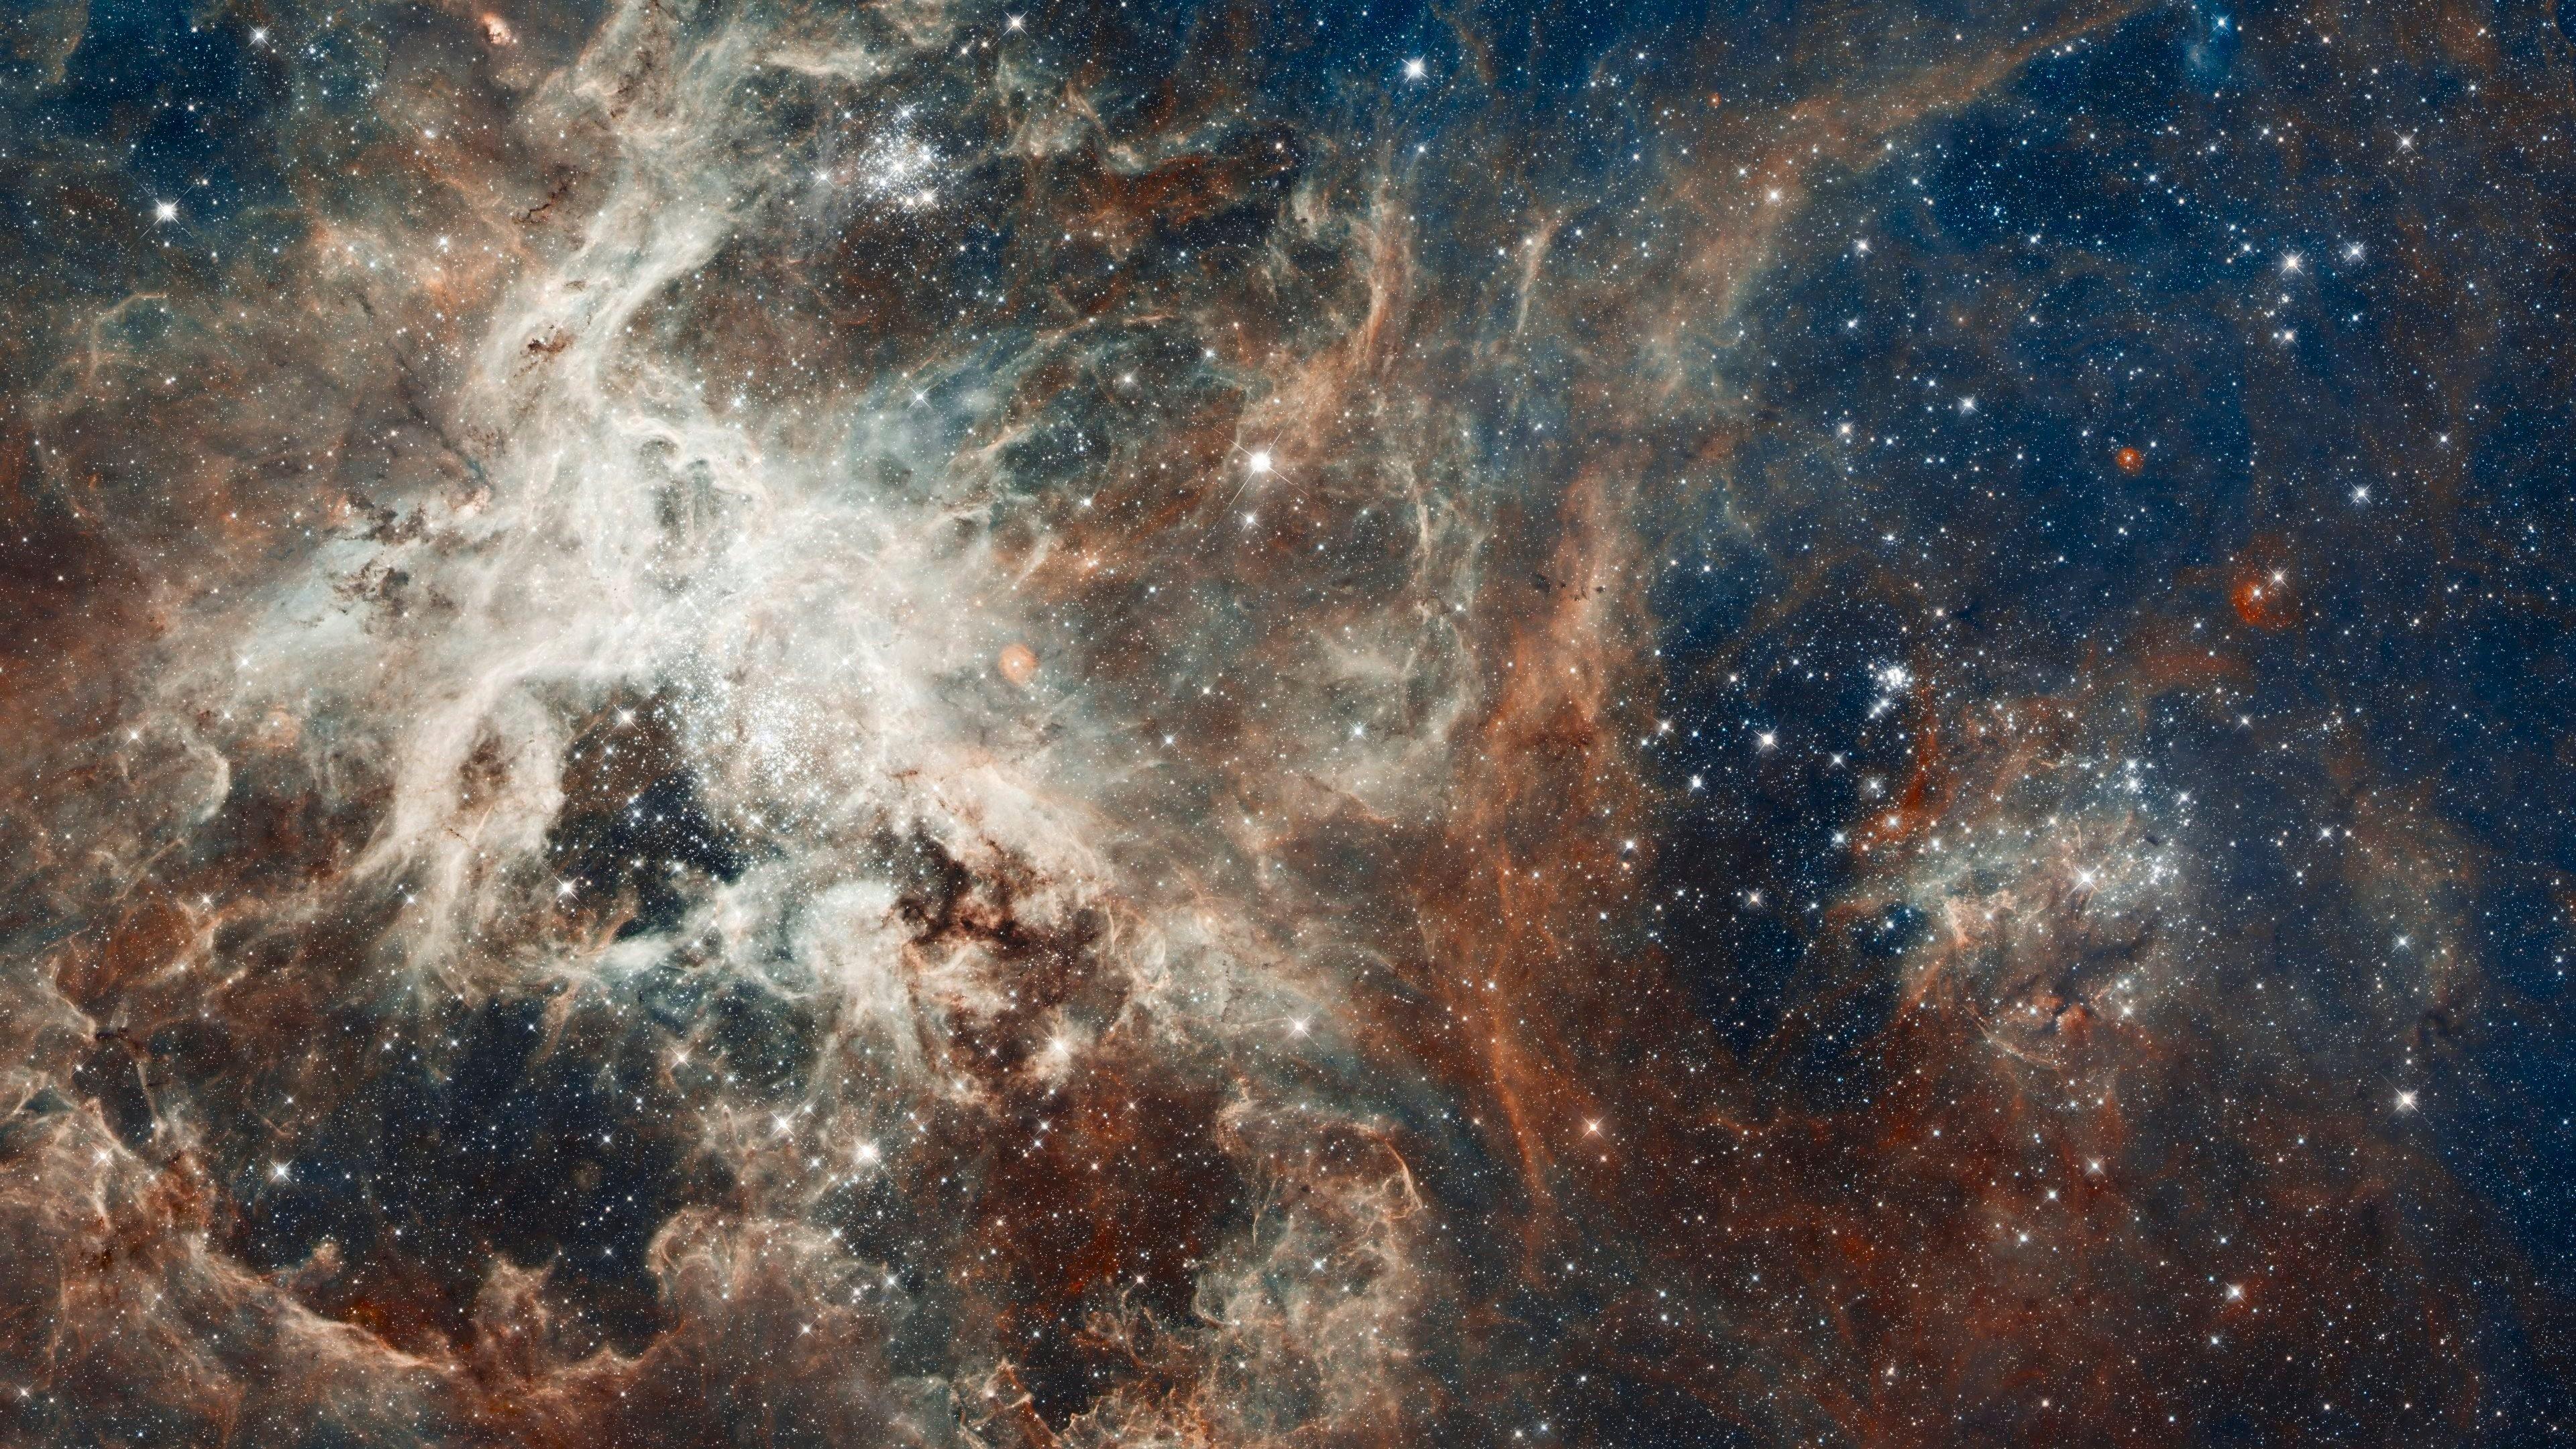 nasa high res galaxy wallpaper - photo #47